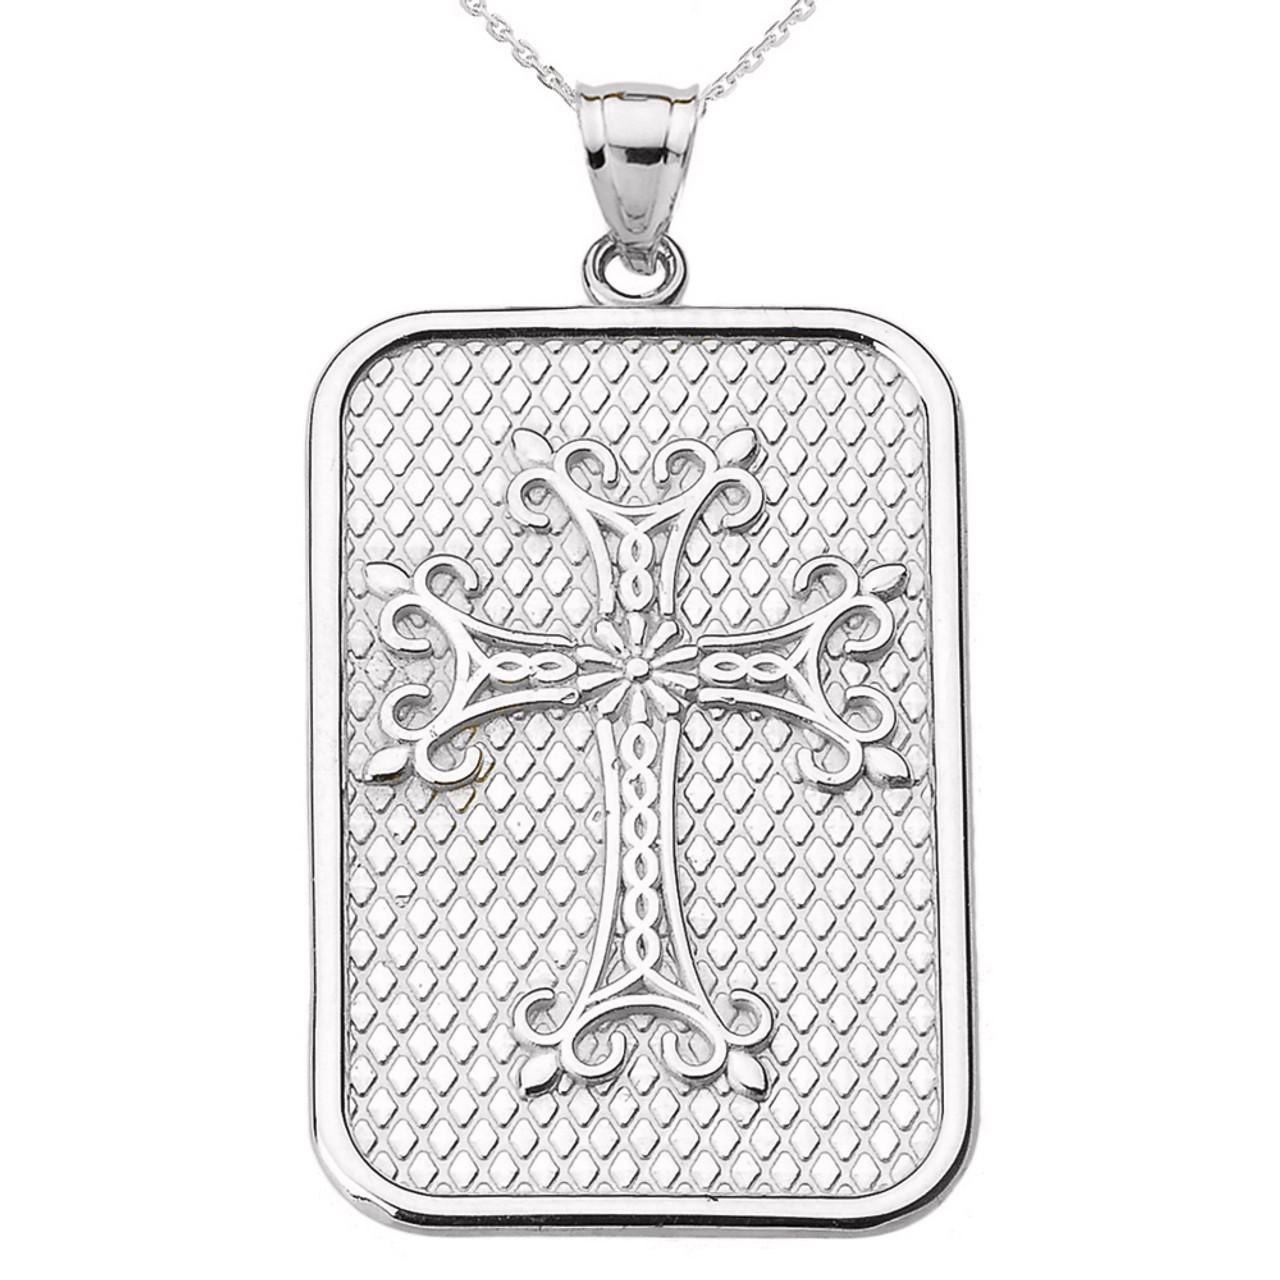 White Gold Armenian Cross Pendant Necklace \u2022 Cross Pendant Necklace \u2022 Armenian Cross Pendant Necklace